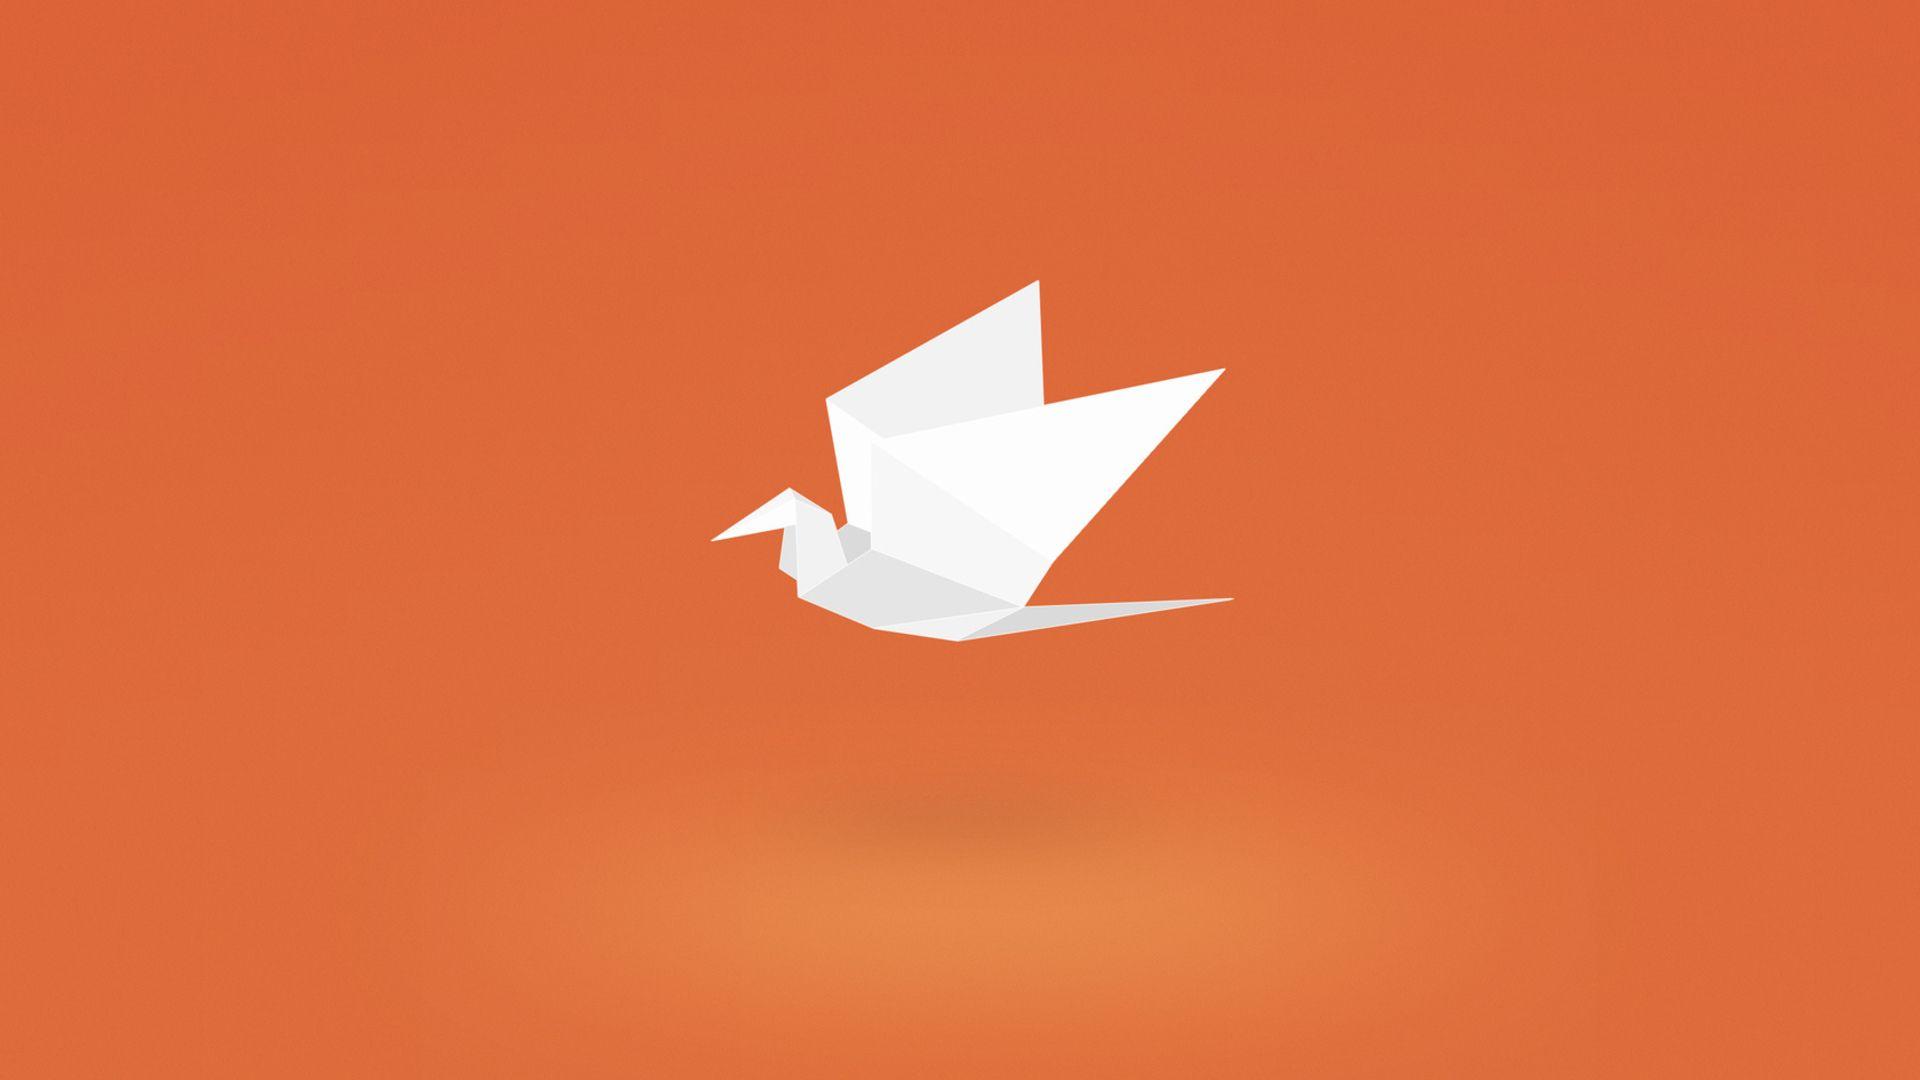 Origami free wallpaper for desktop